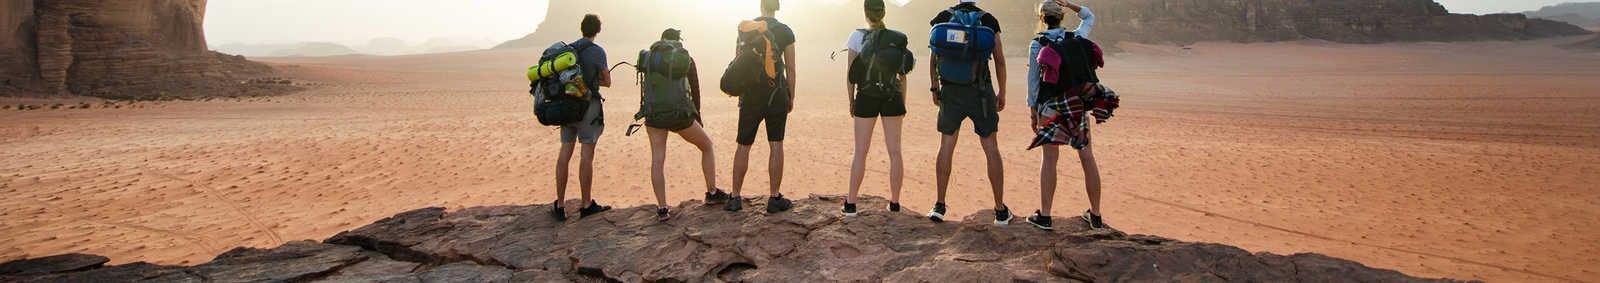 Friends overlooking Wadi rum national park in Jordan